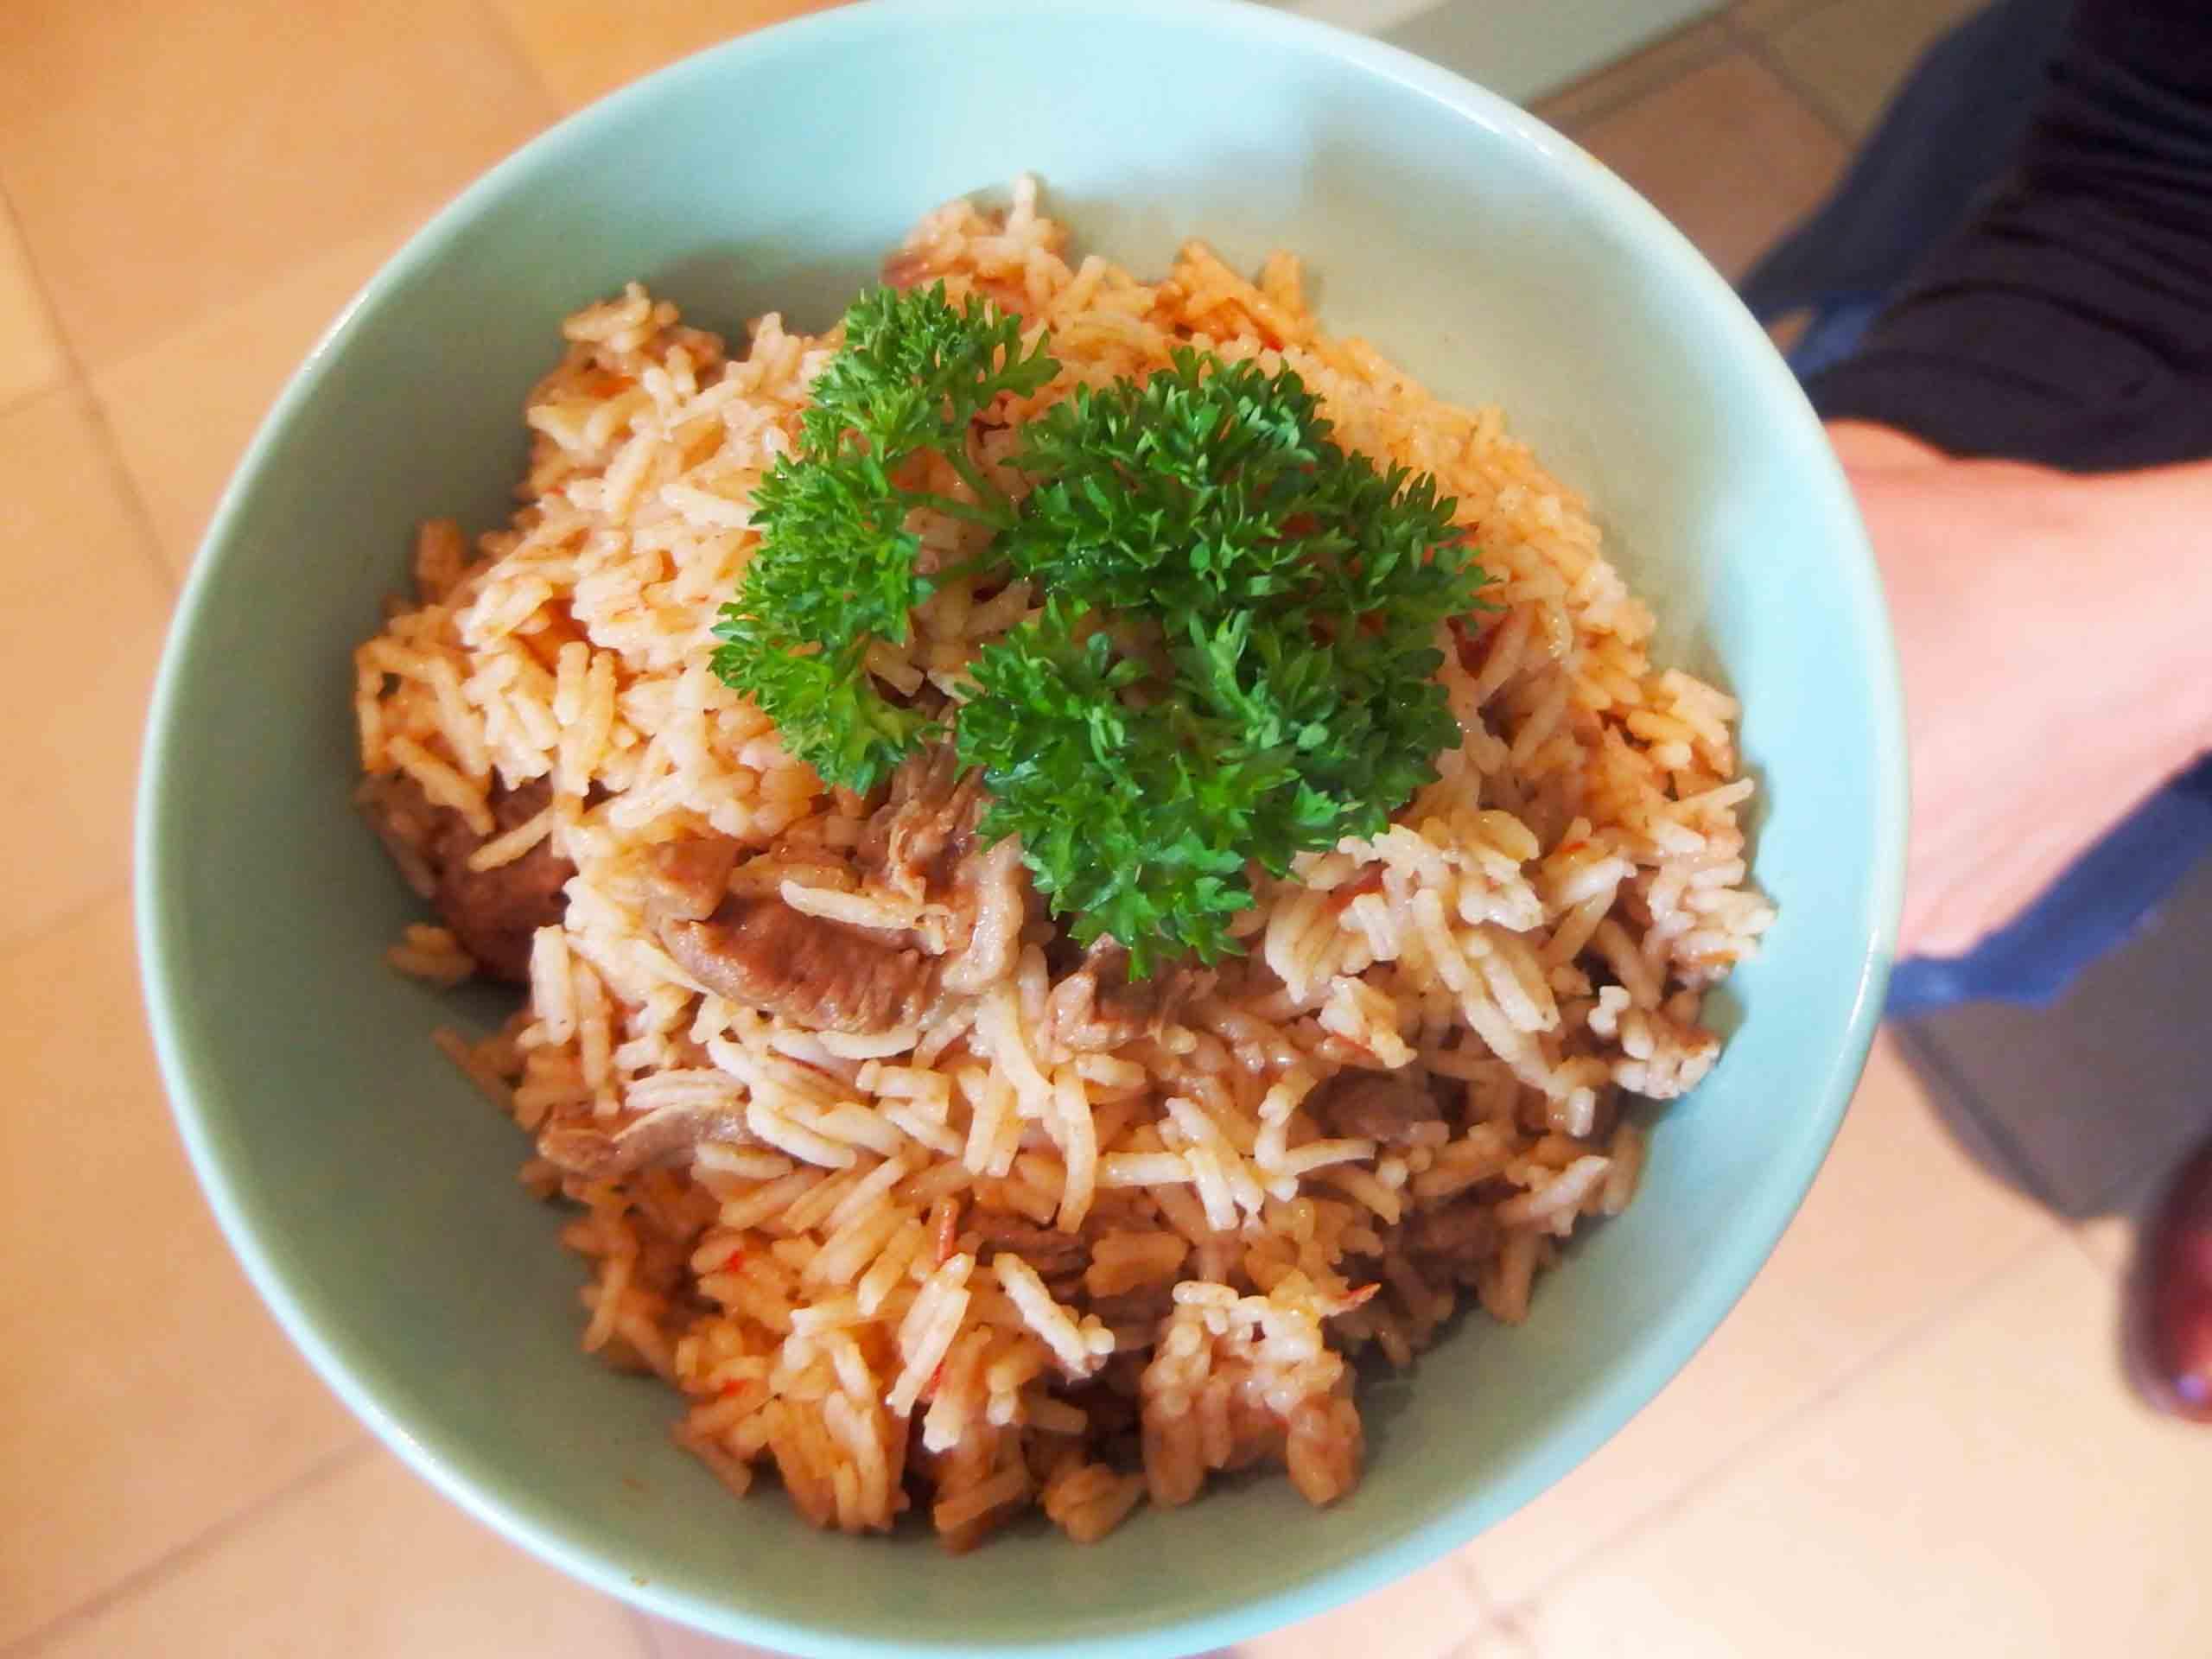 53. Djibouti: Skoudehkaris (Djibouti Rice)